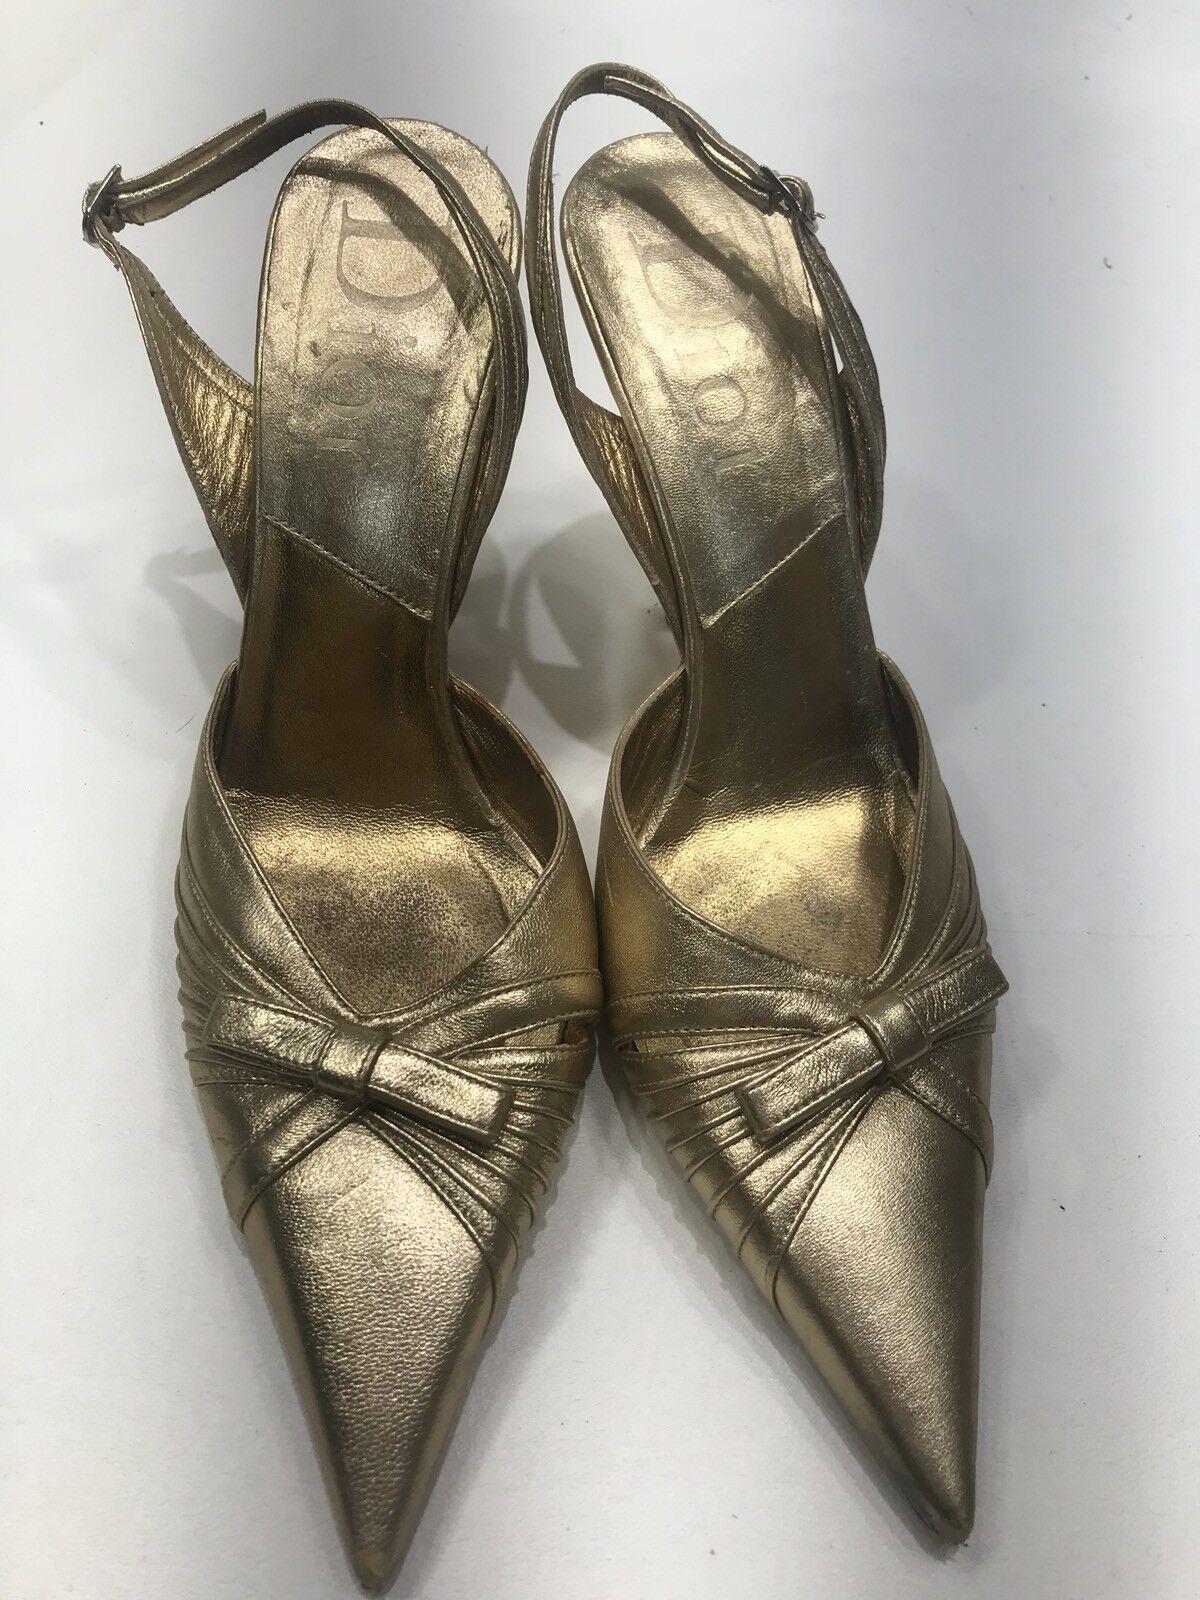 "nuovo sadico Dior Pumps Pumps Pumps 39.5 oro Leather Slingbacks Bows ""D"" Charm LOGO Buckles  grandi prezzi scontati"